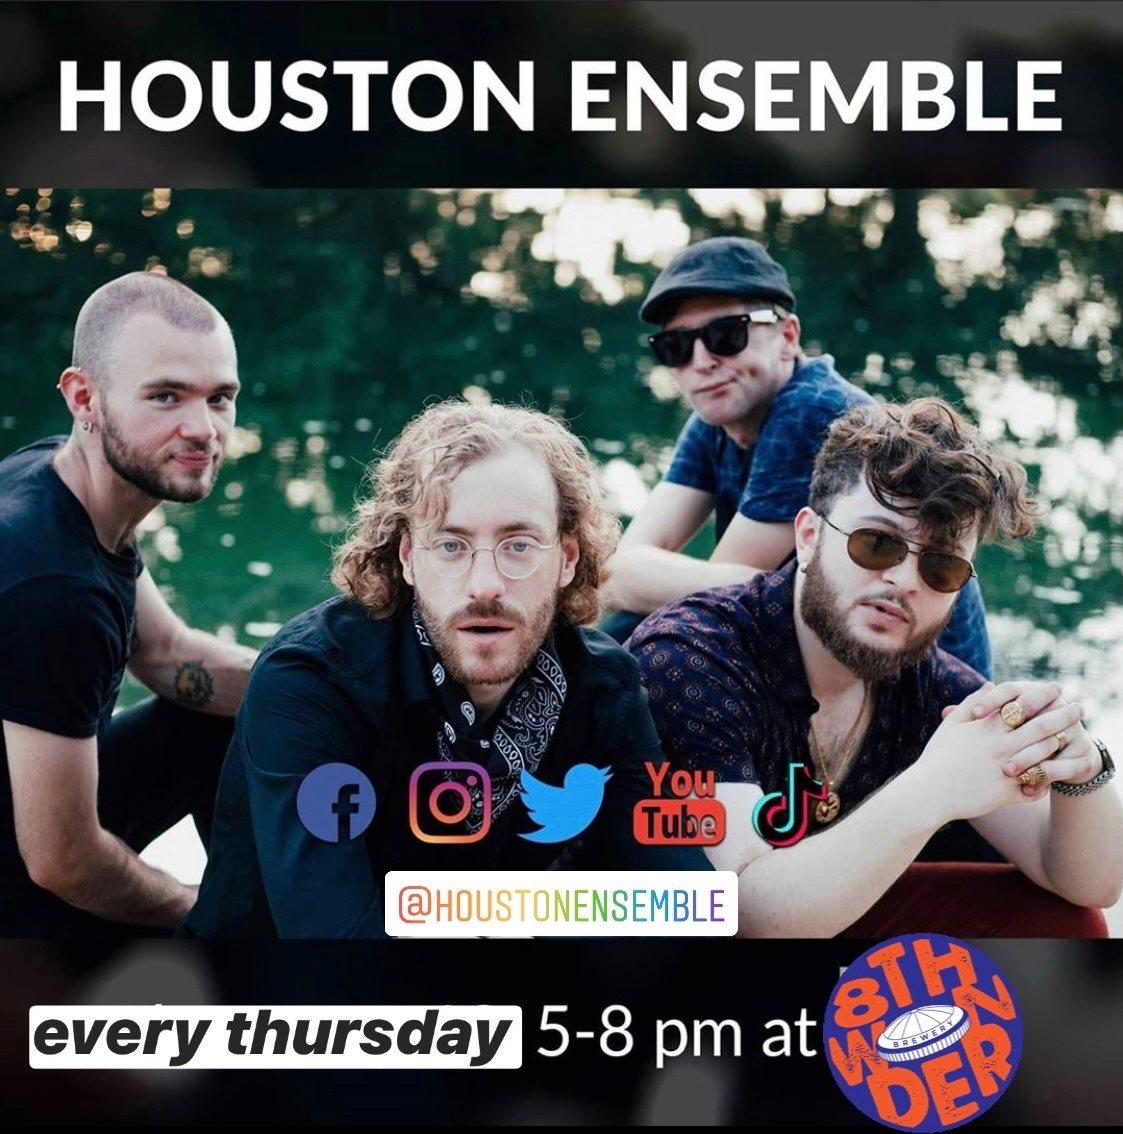 Thursday Jazz with Houston Ensemble at 8th Wonder Brewery